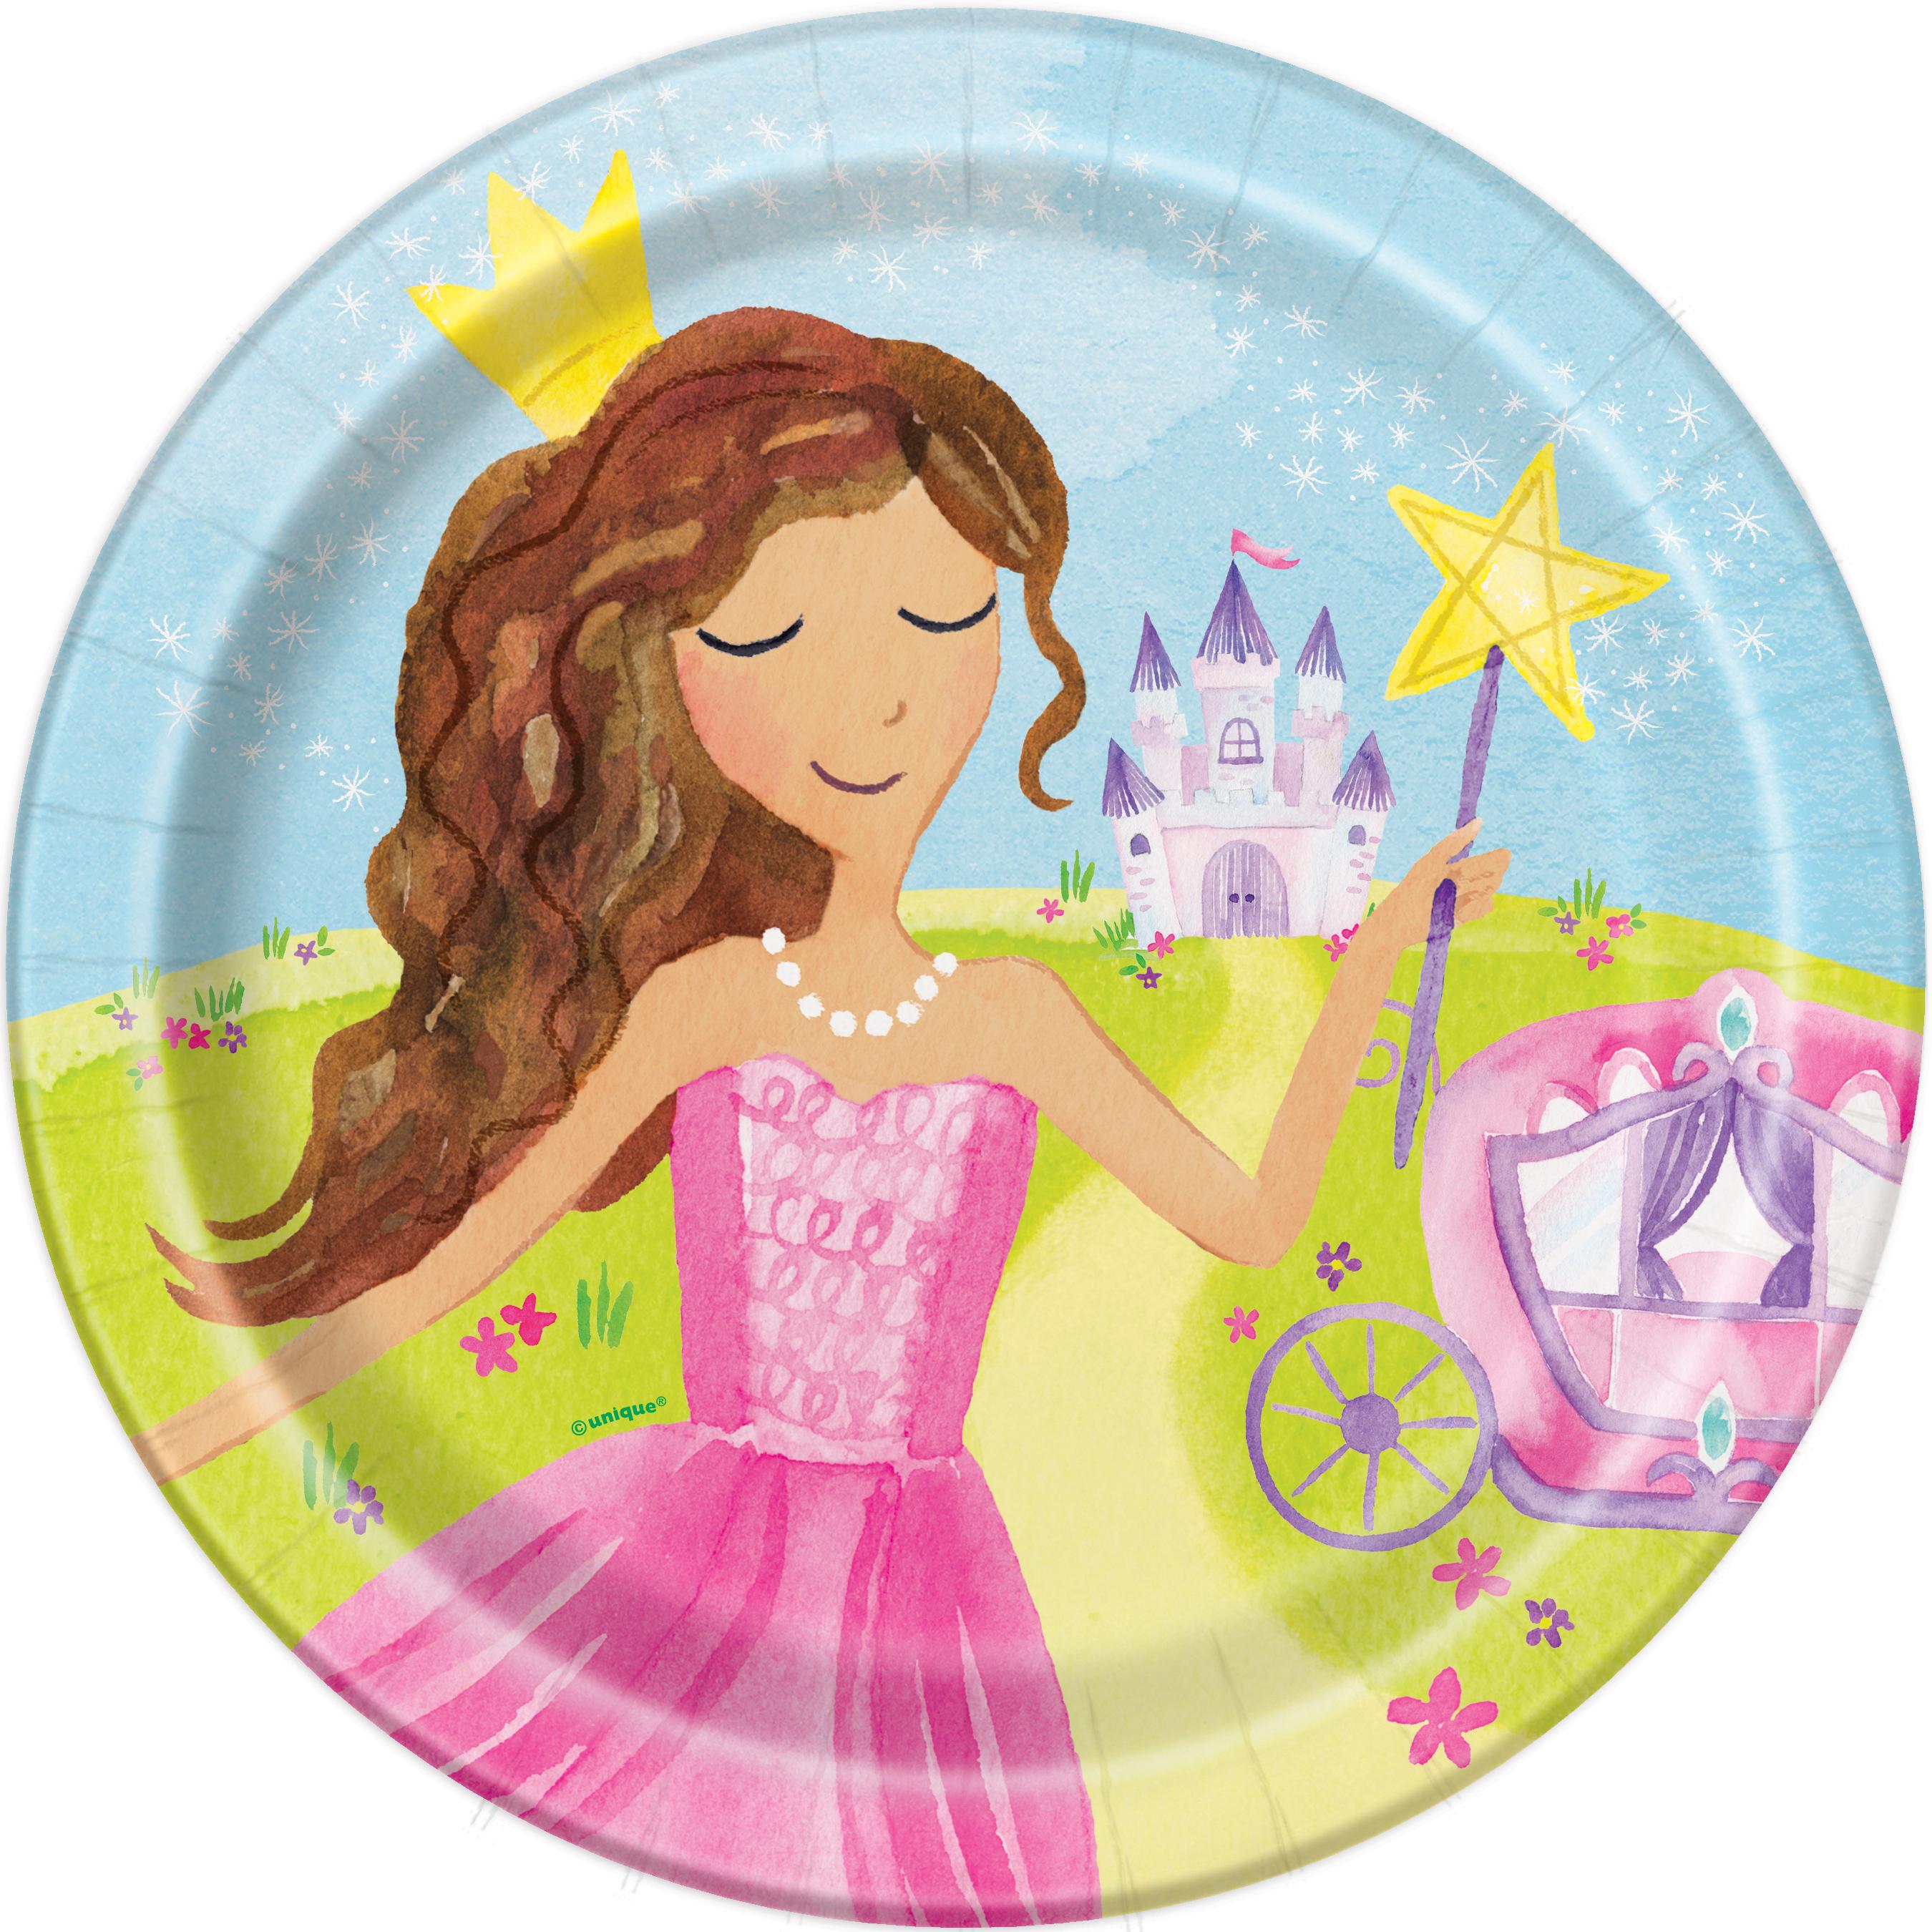 8 x Magical Pink Princess u0026 Cinderella Carriage Paper Party Plates Girl Birthday  sc 1 st  eBay & 8 x Magical Pink Princess u0026 Cinderella Carriage Paper Party Plates ...